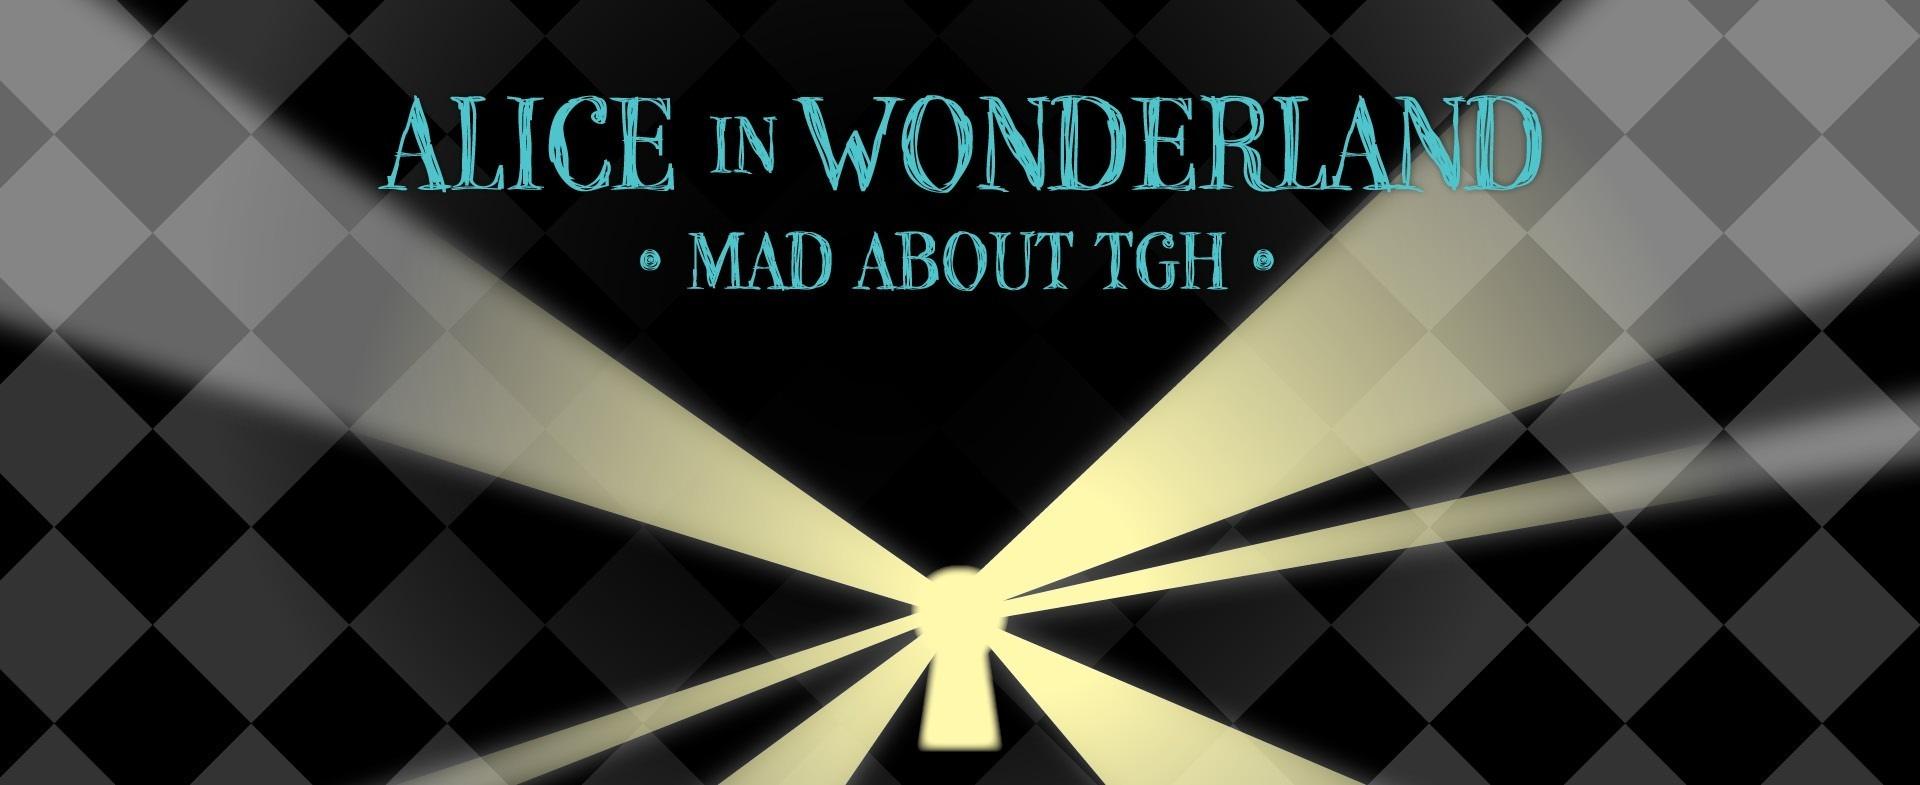 Alice in Wonderland gala header